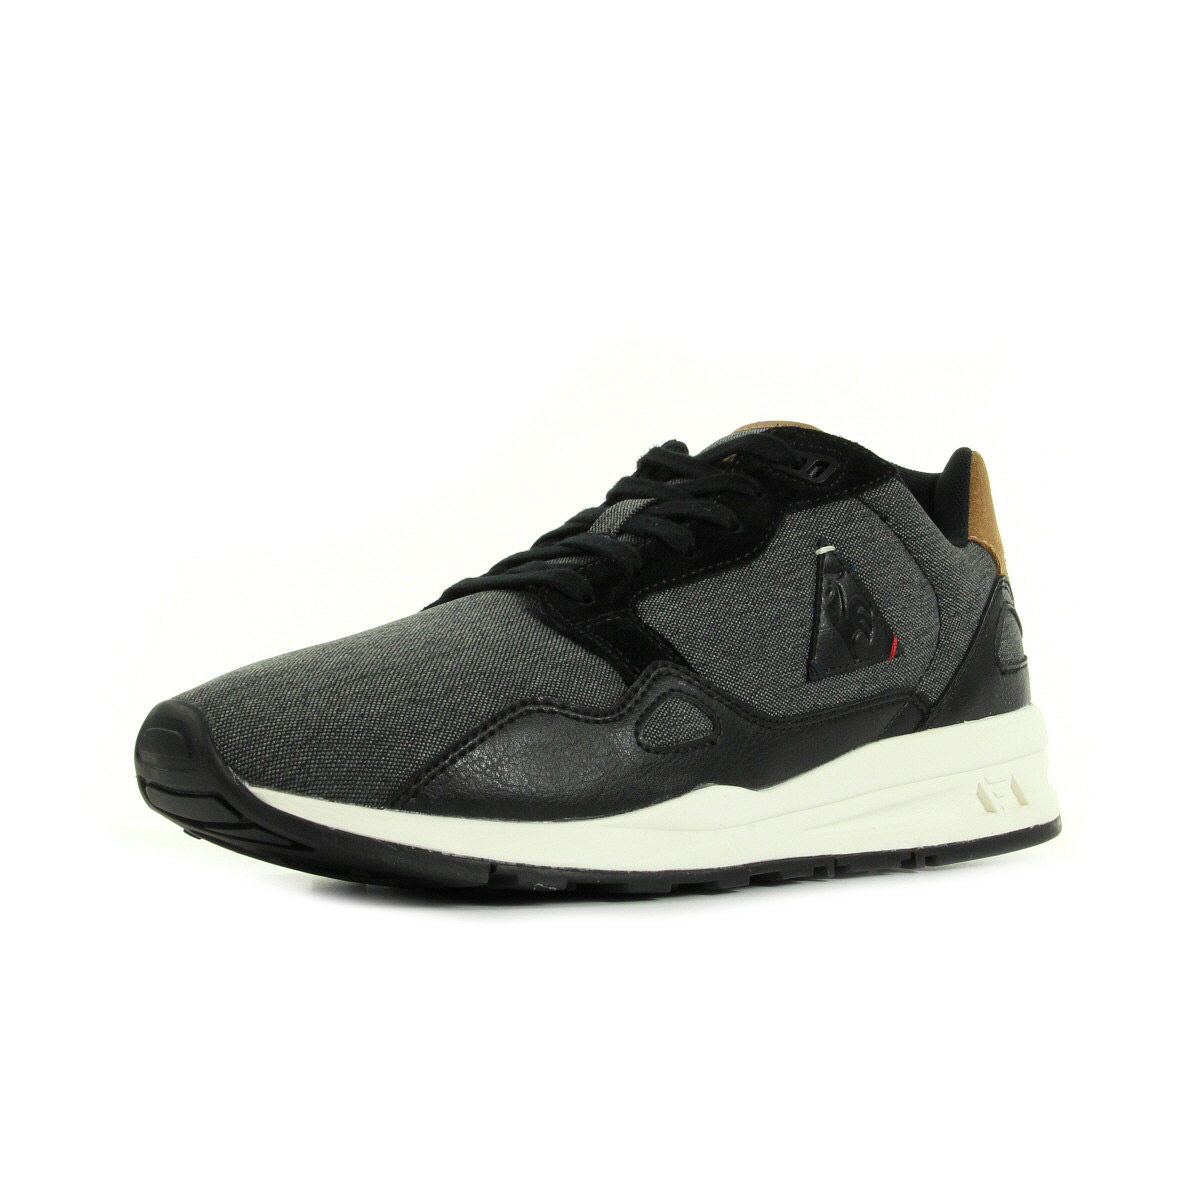 le coq sportif lcs r900 2 tones 1620326 chaussures homme homme. Black Bedroom Furniture Sets. Home Design Ideas